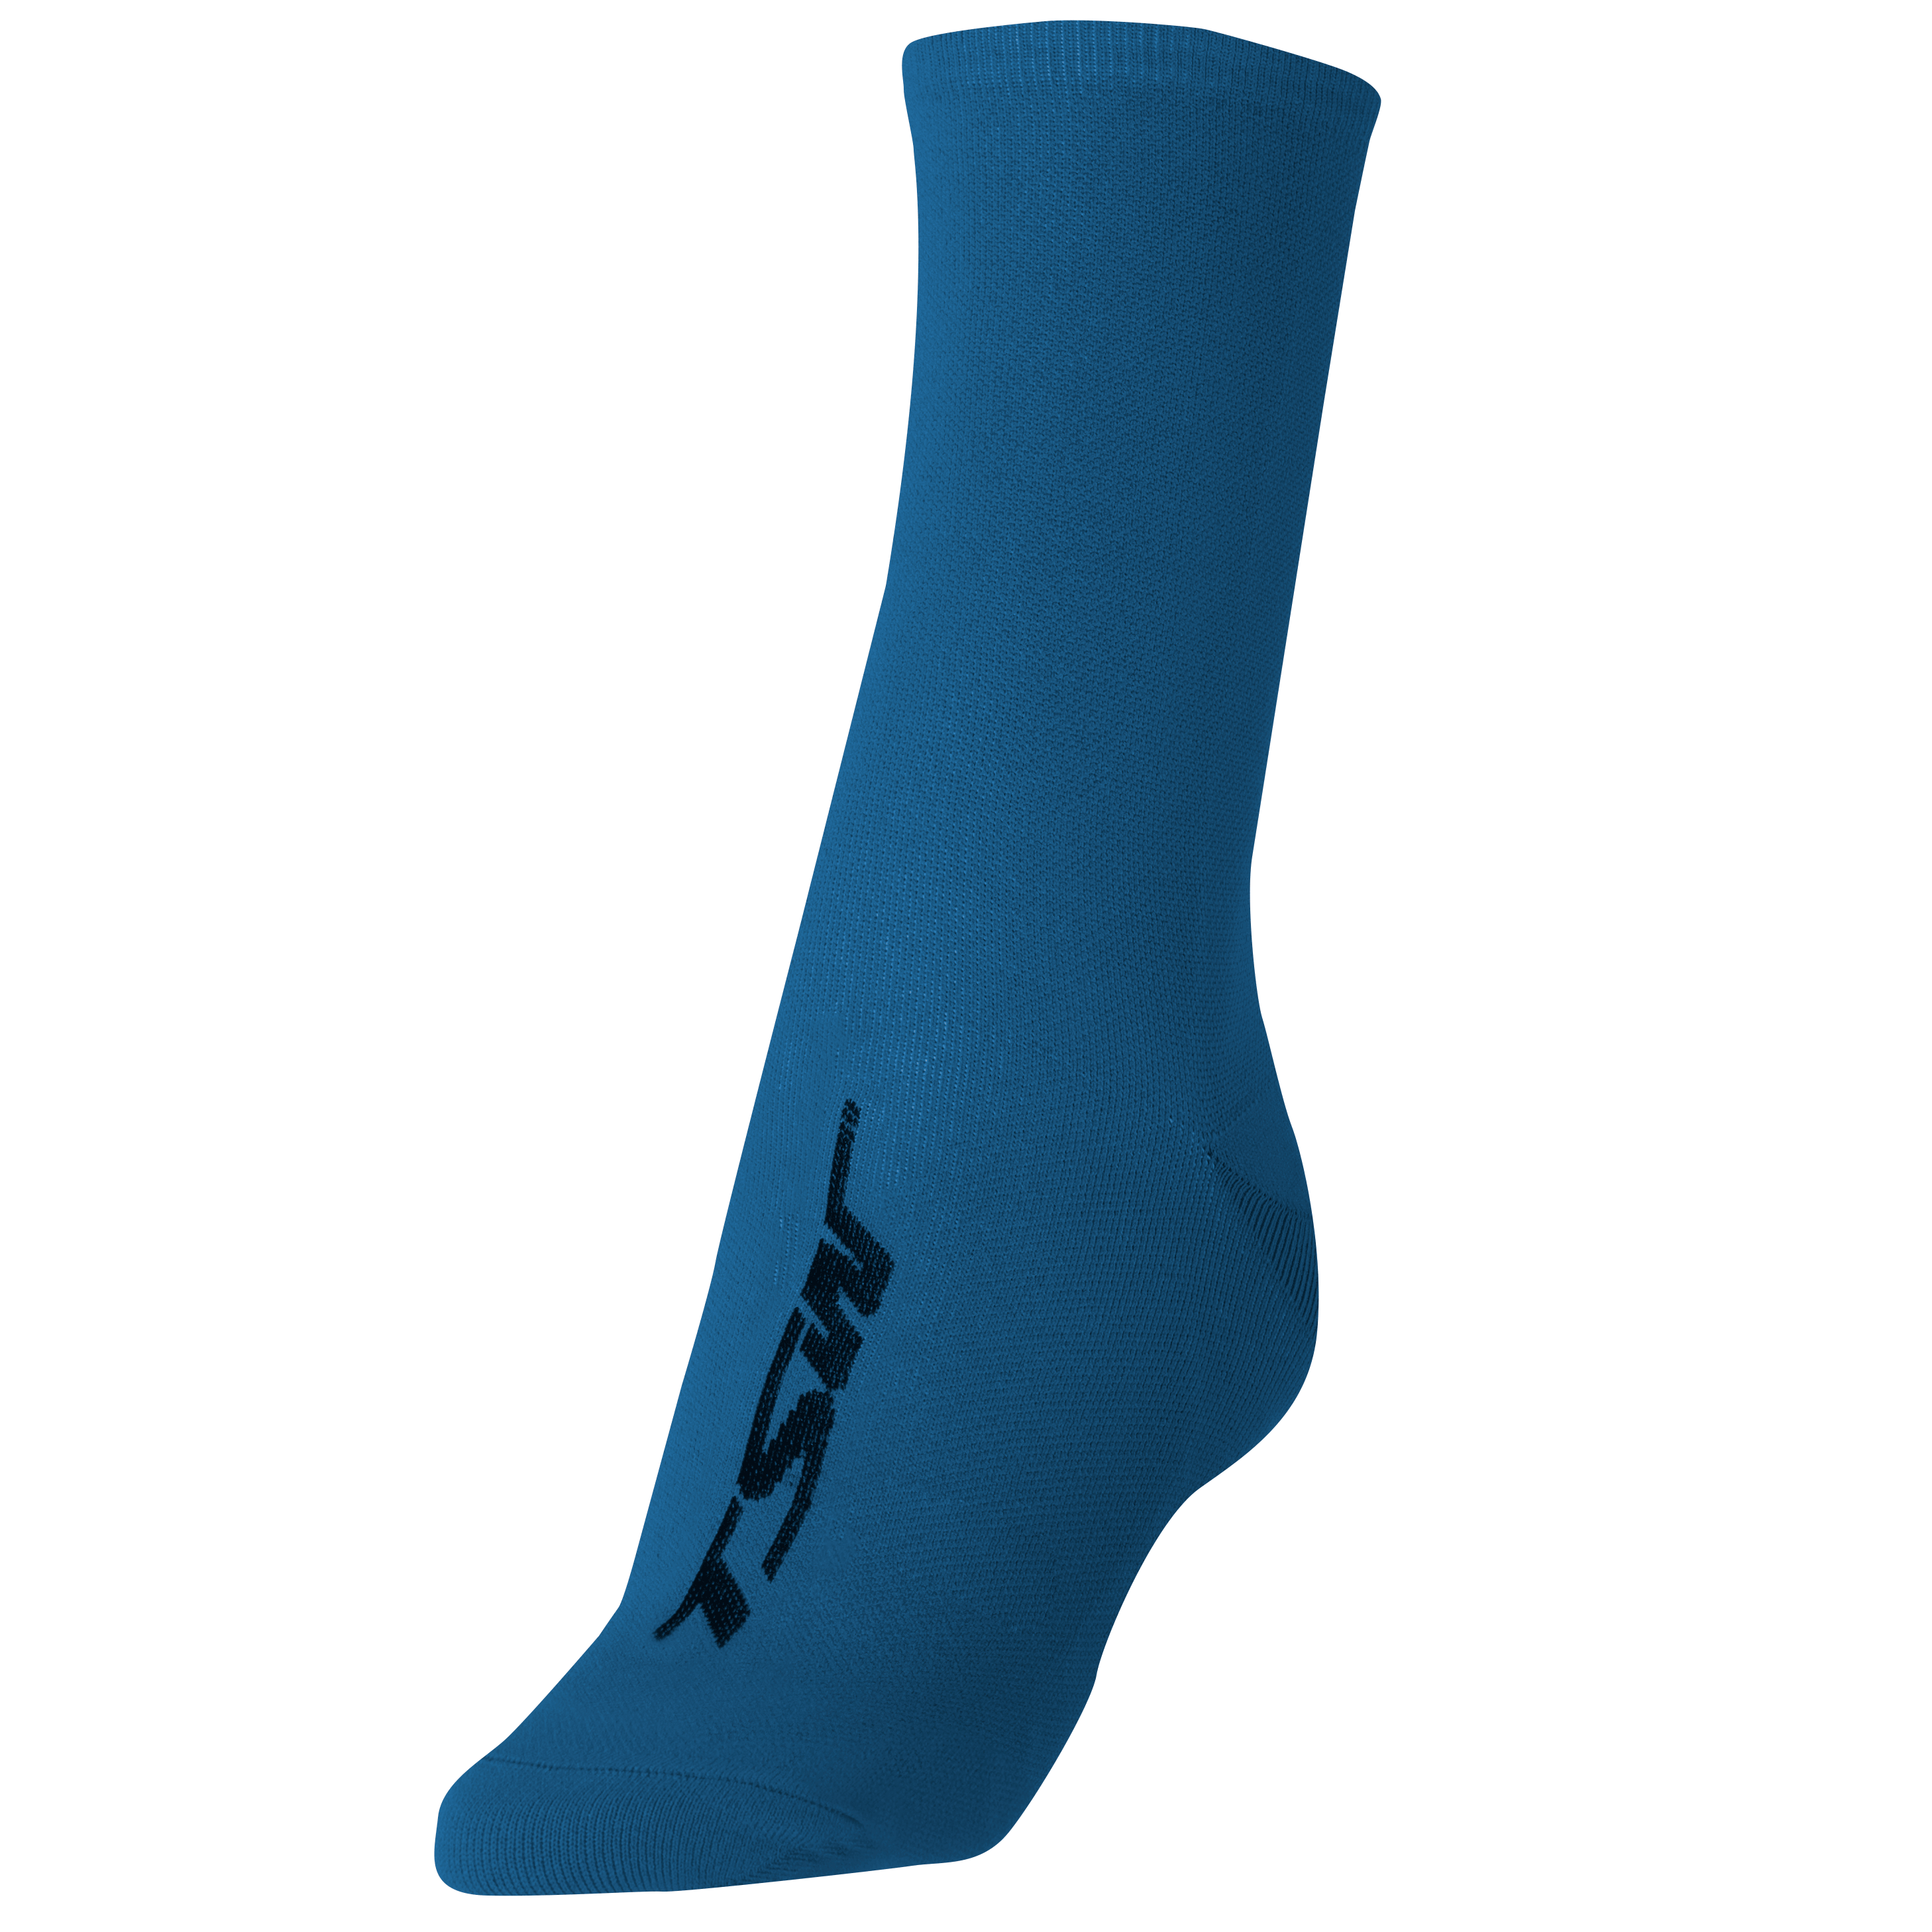 Meias ciclísmo mod. 01 - Azul